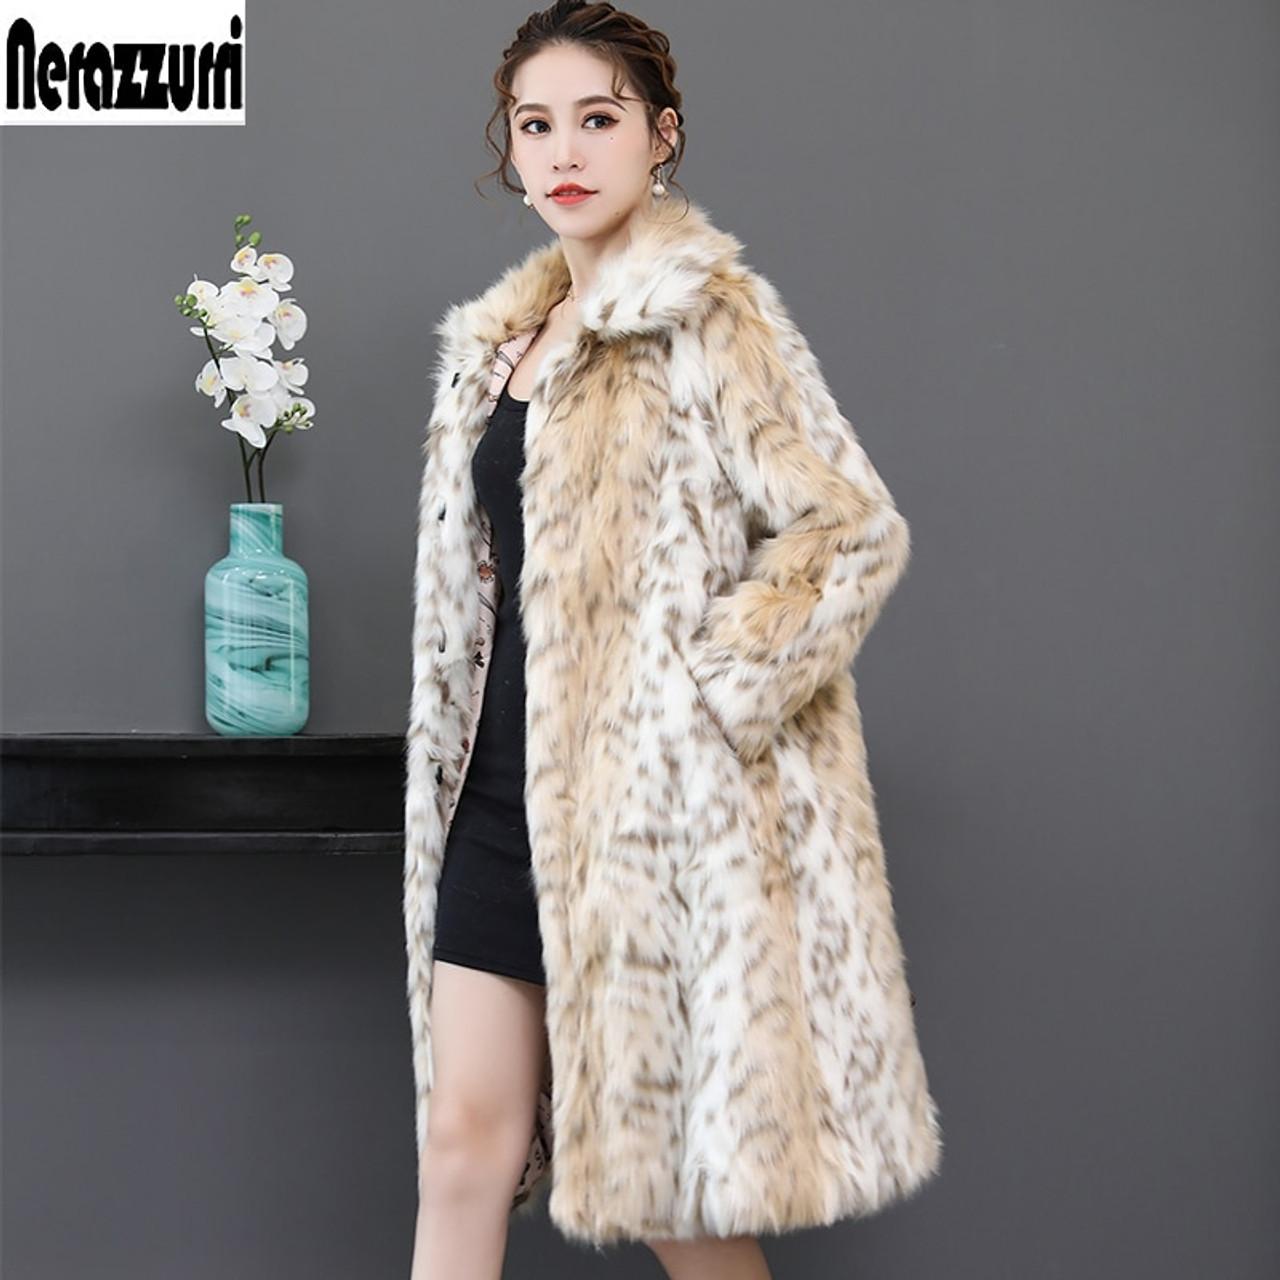 9c5f38292f0 ... Nerazzurri Long leopard faux fur coat for woman raglan sleeve winter fake  fur coat fluffy leopard ...